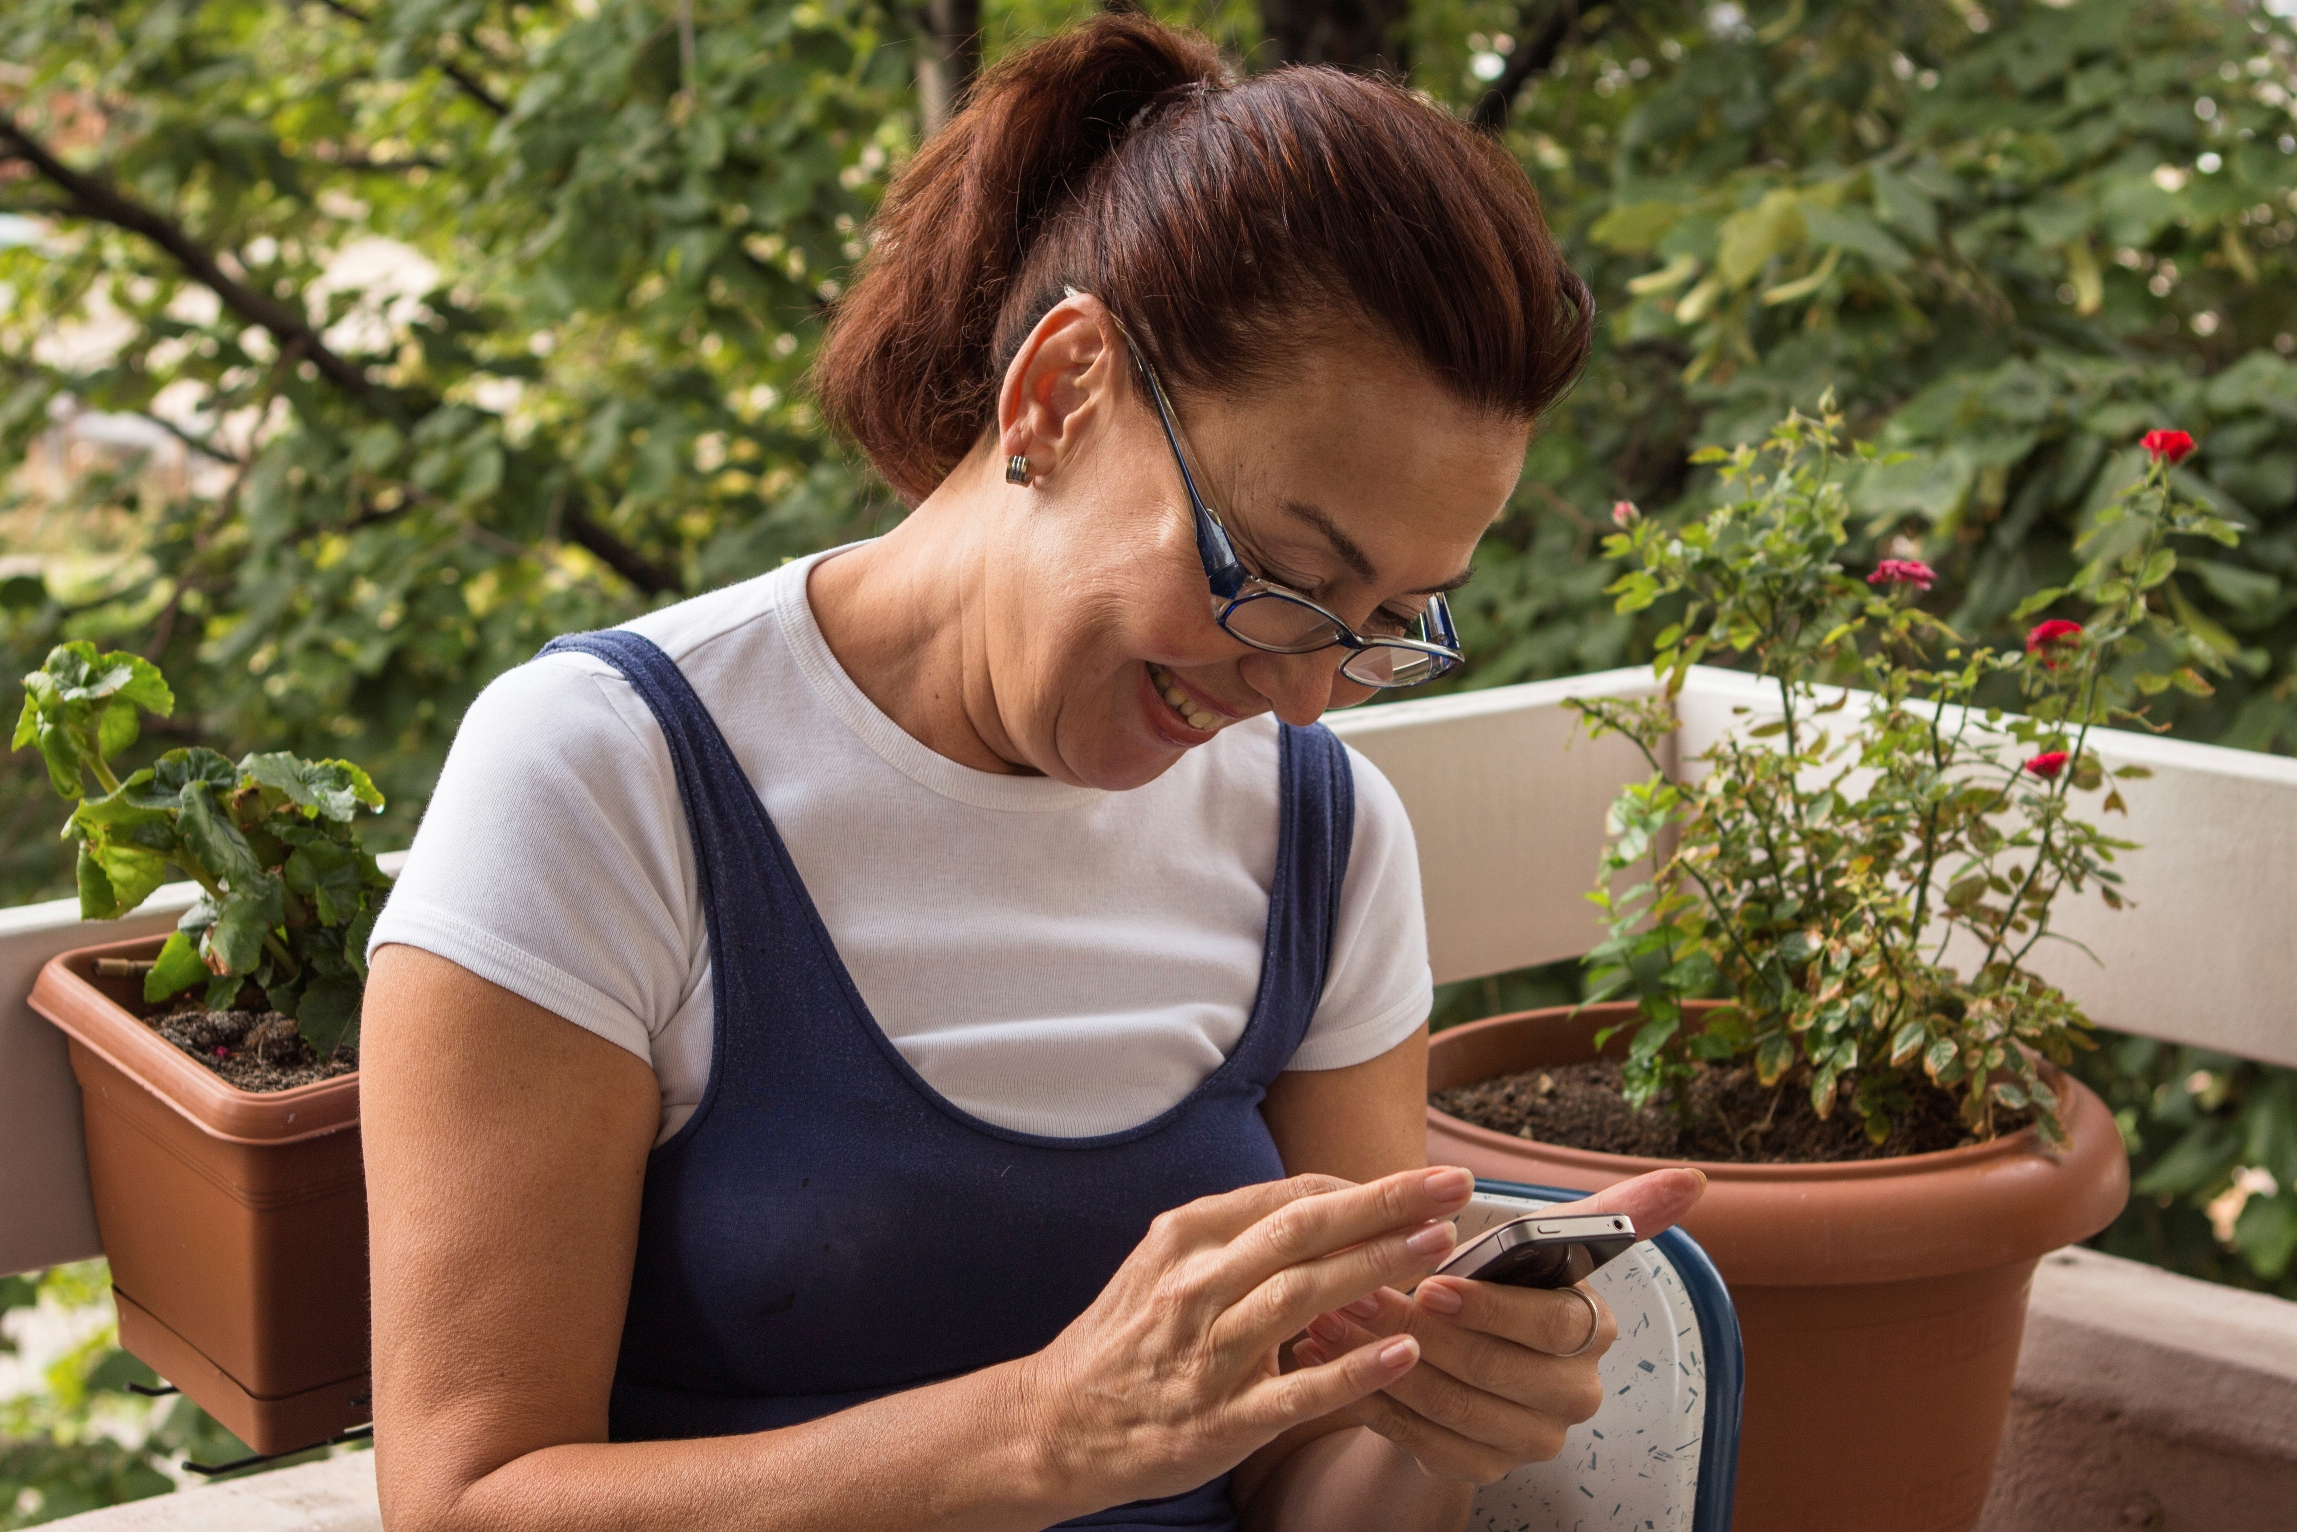 woman looking at phone iStock_000048887300_Full.jpg